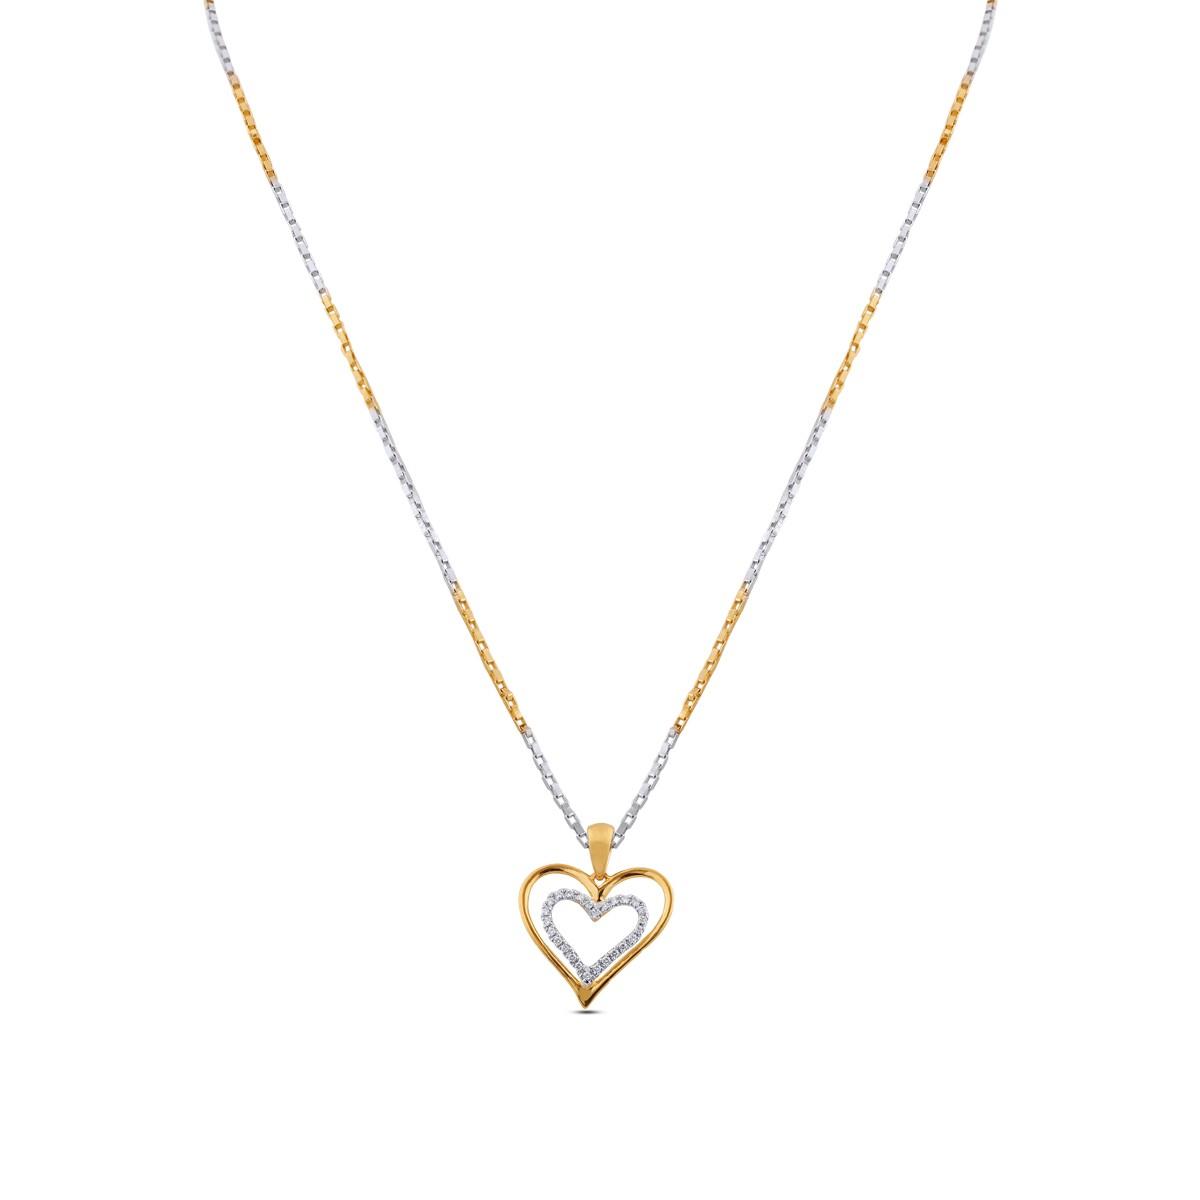 Reyna Diamond Pendant with Chain